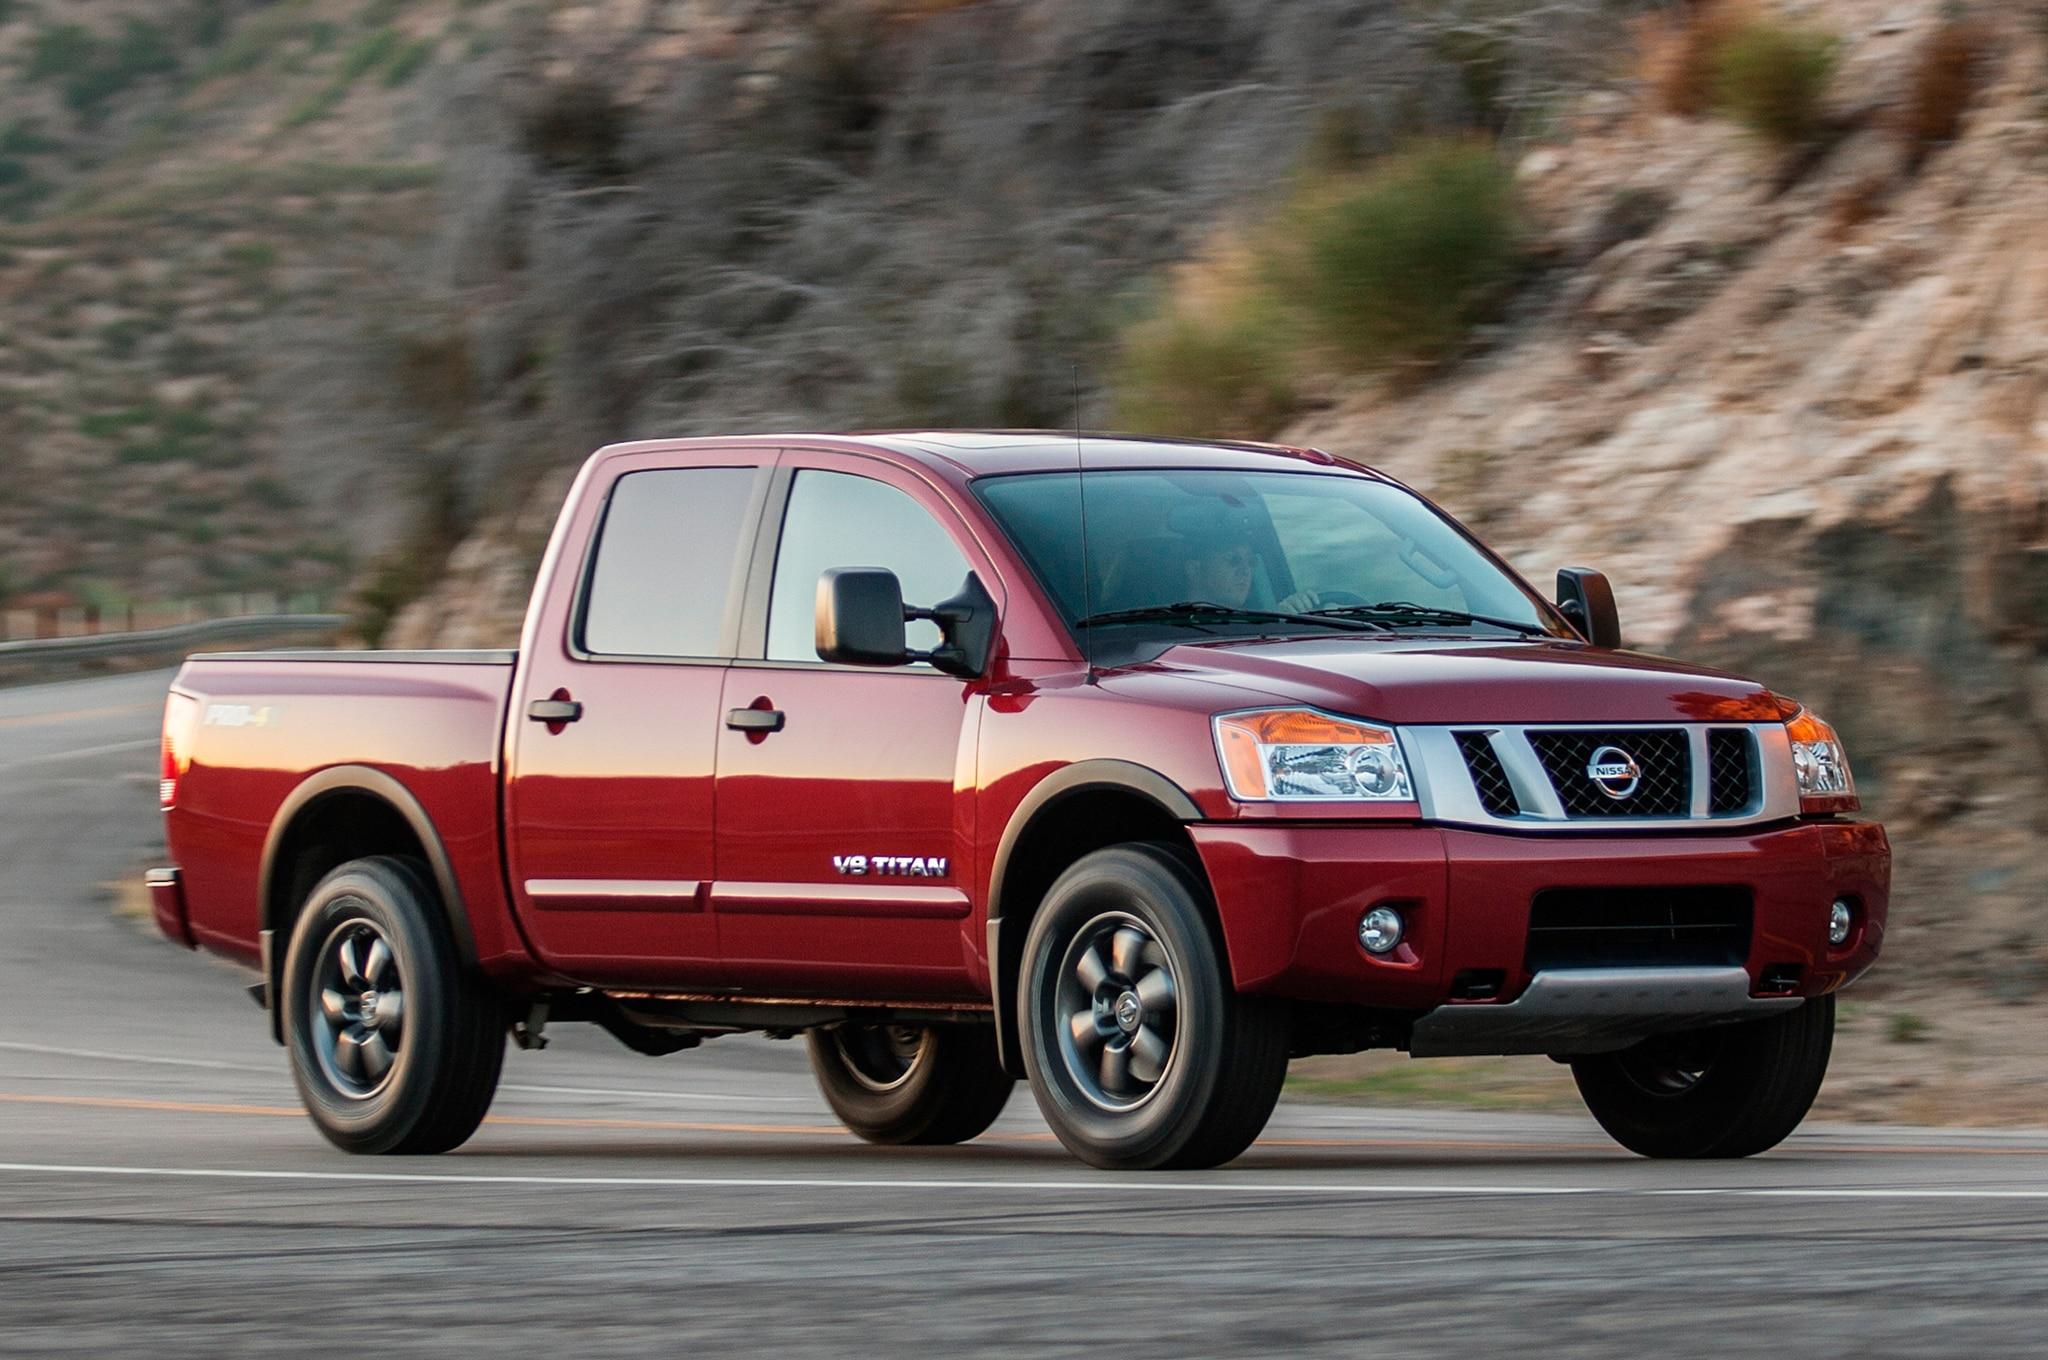 2013 Nissan Titan Three Quarters In Motion View